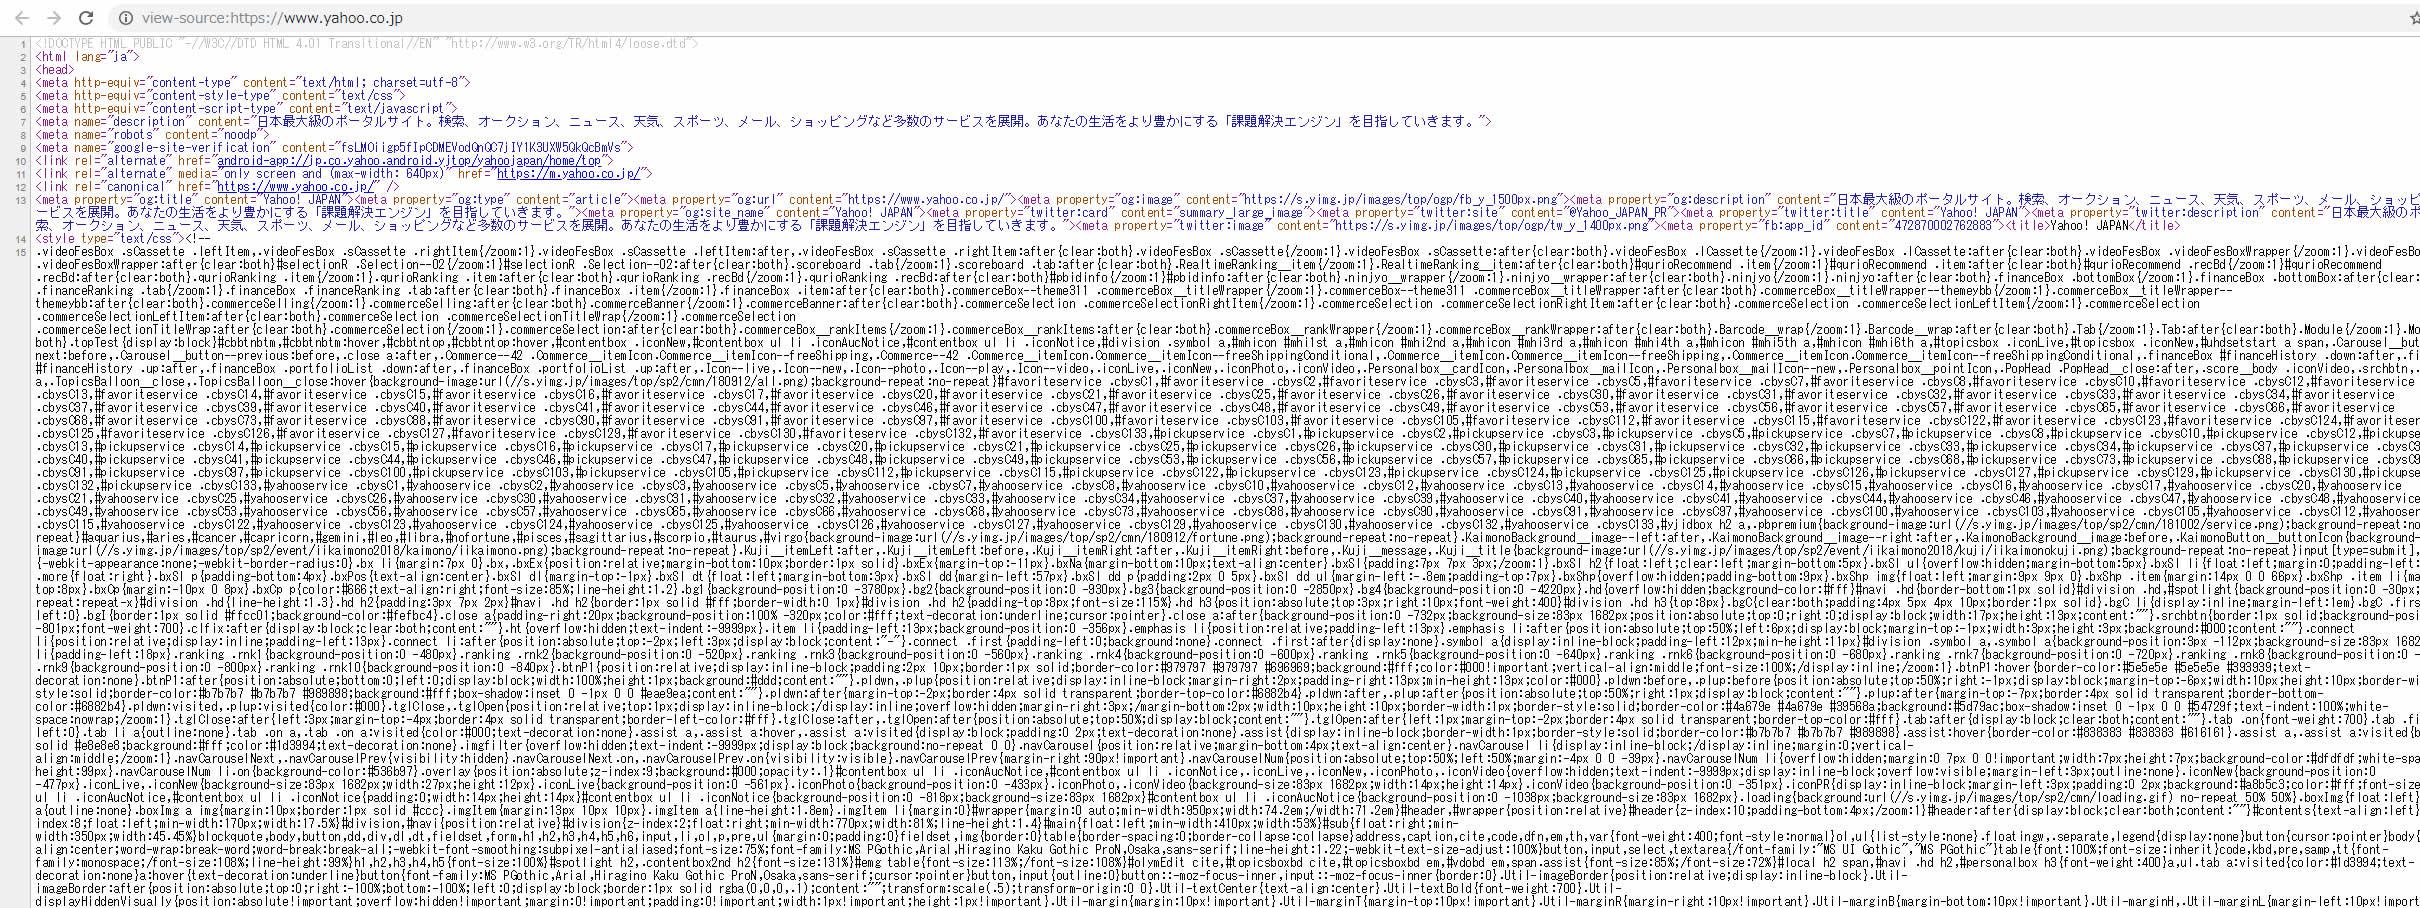 Yahoo!japanのソース